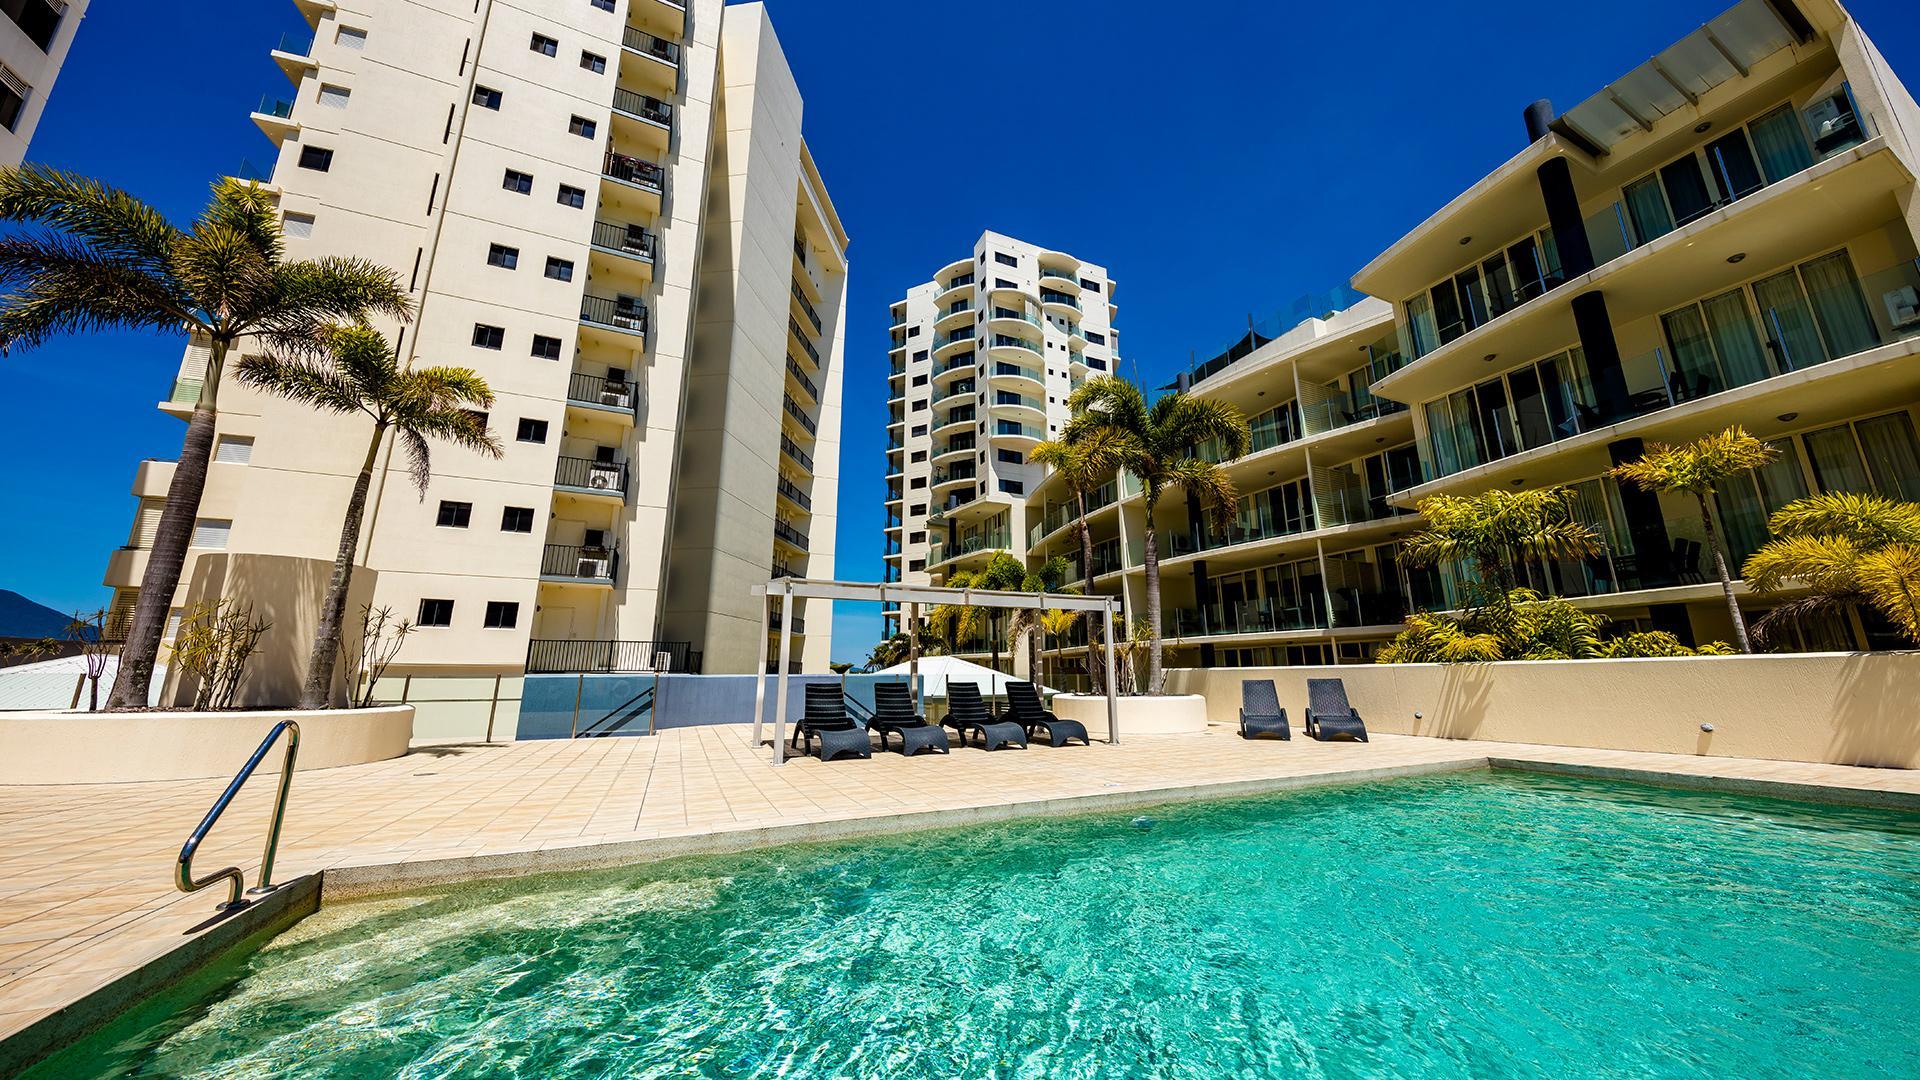 Ocean-View Cairns Apartment Escape, Cairns, Queensland